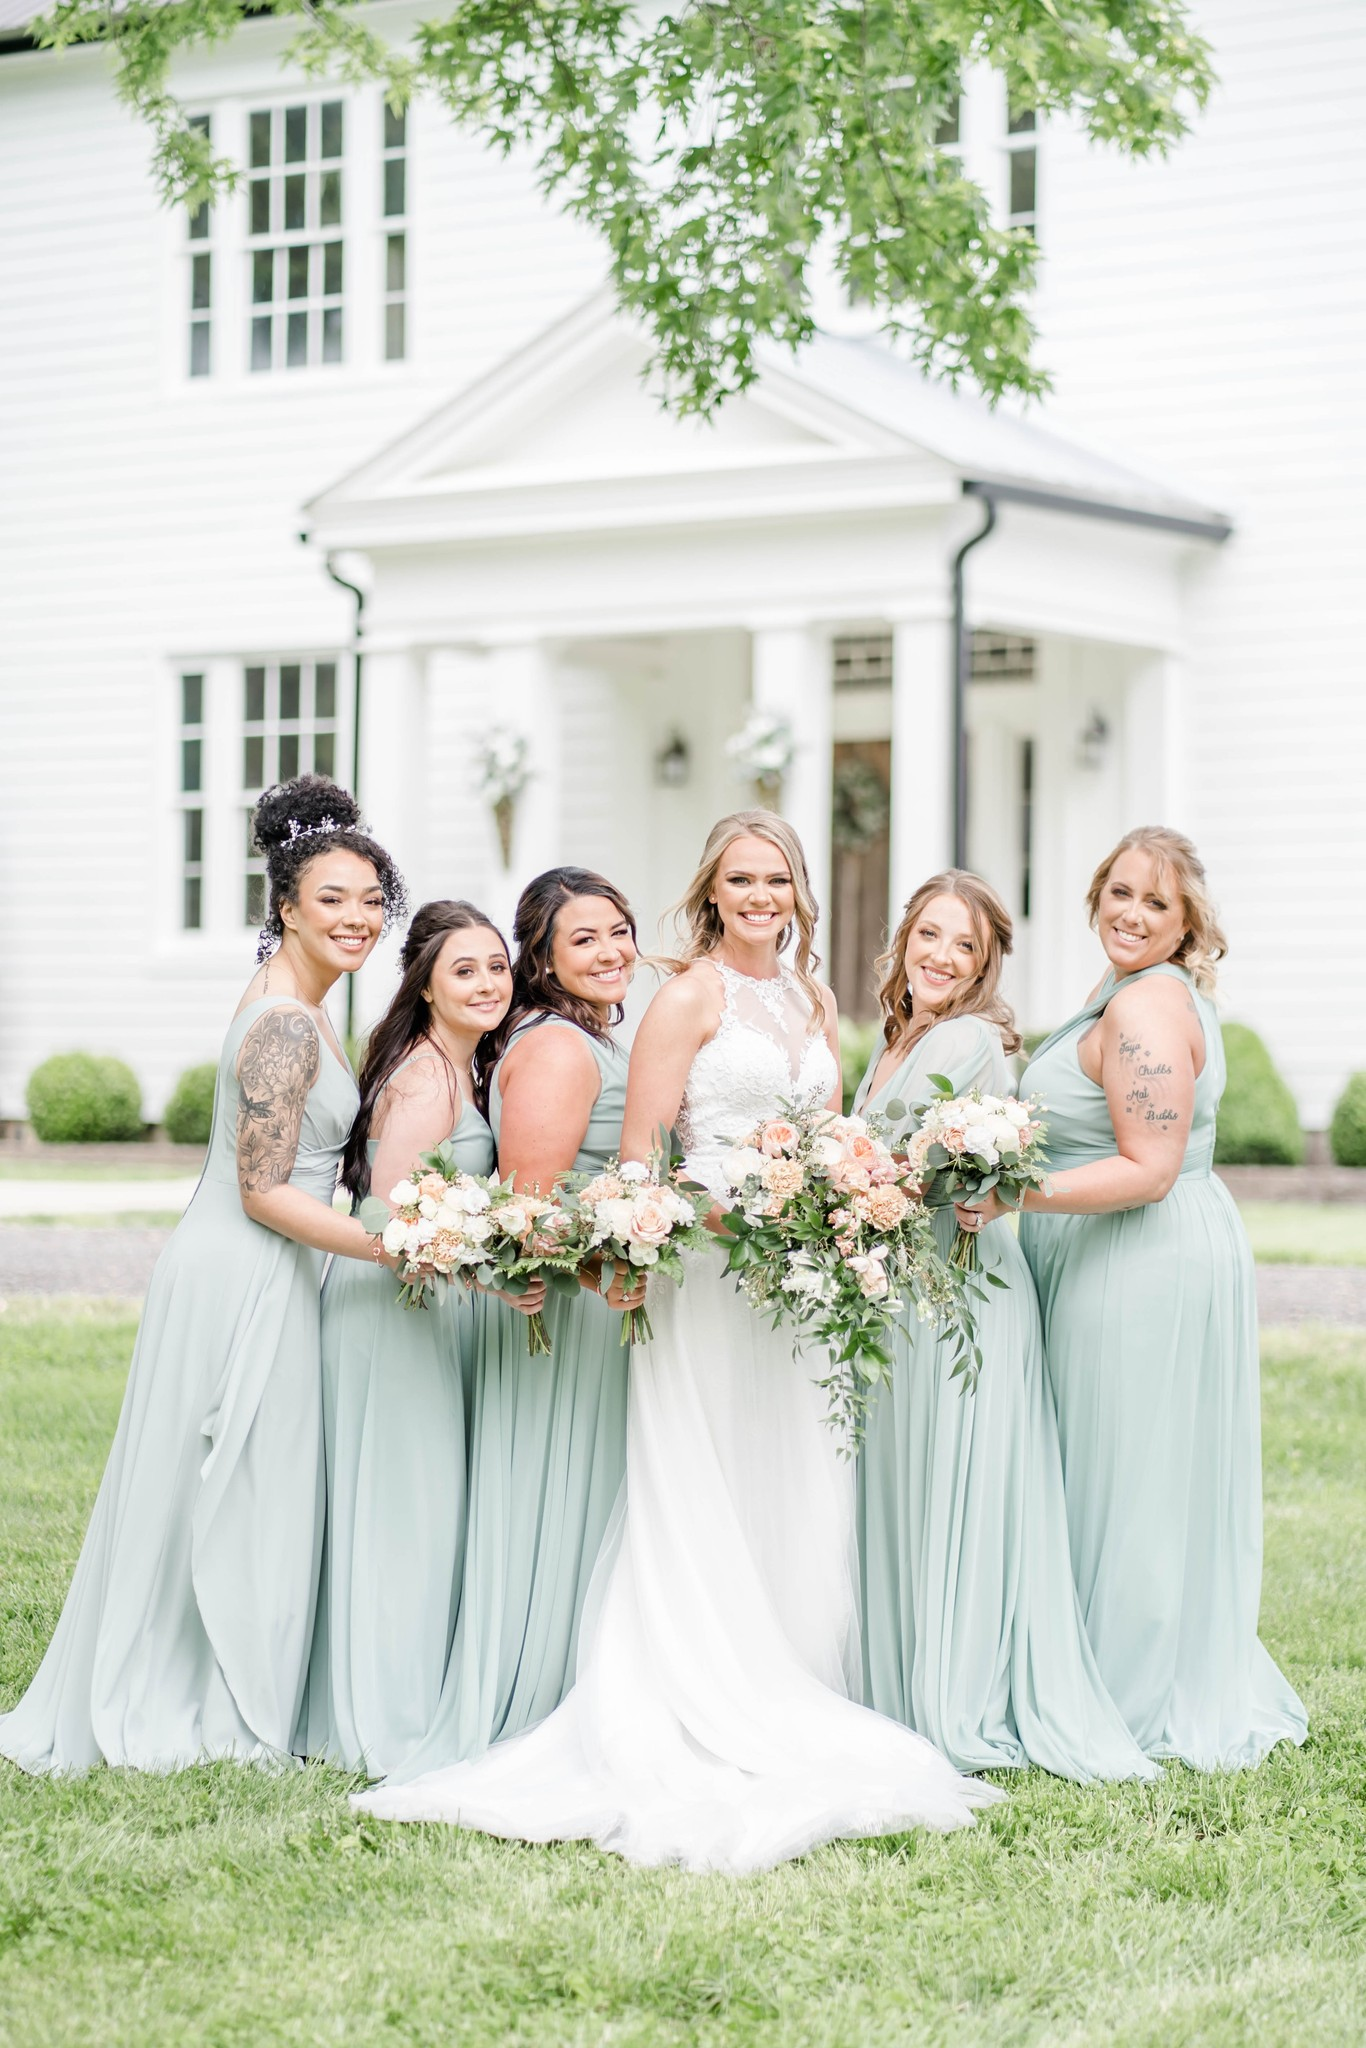 Long sage green bridesmaids dresses